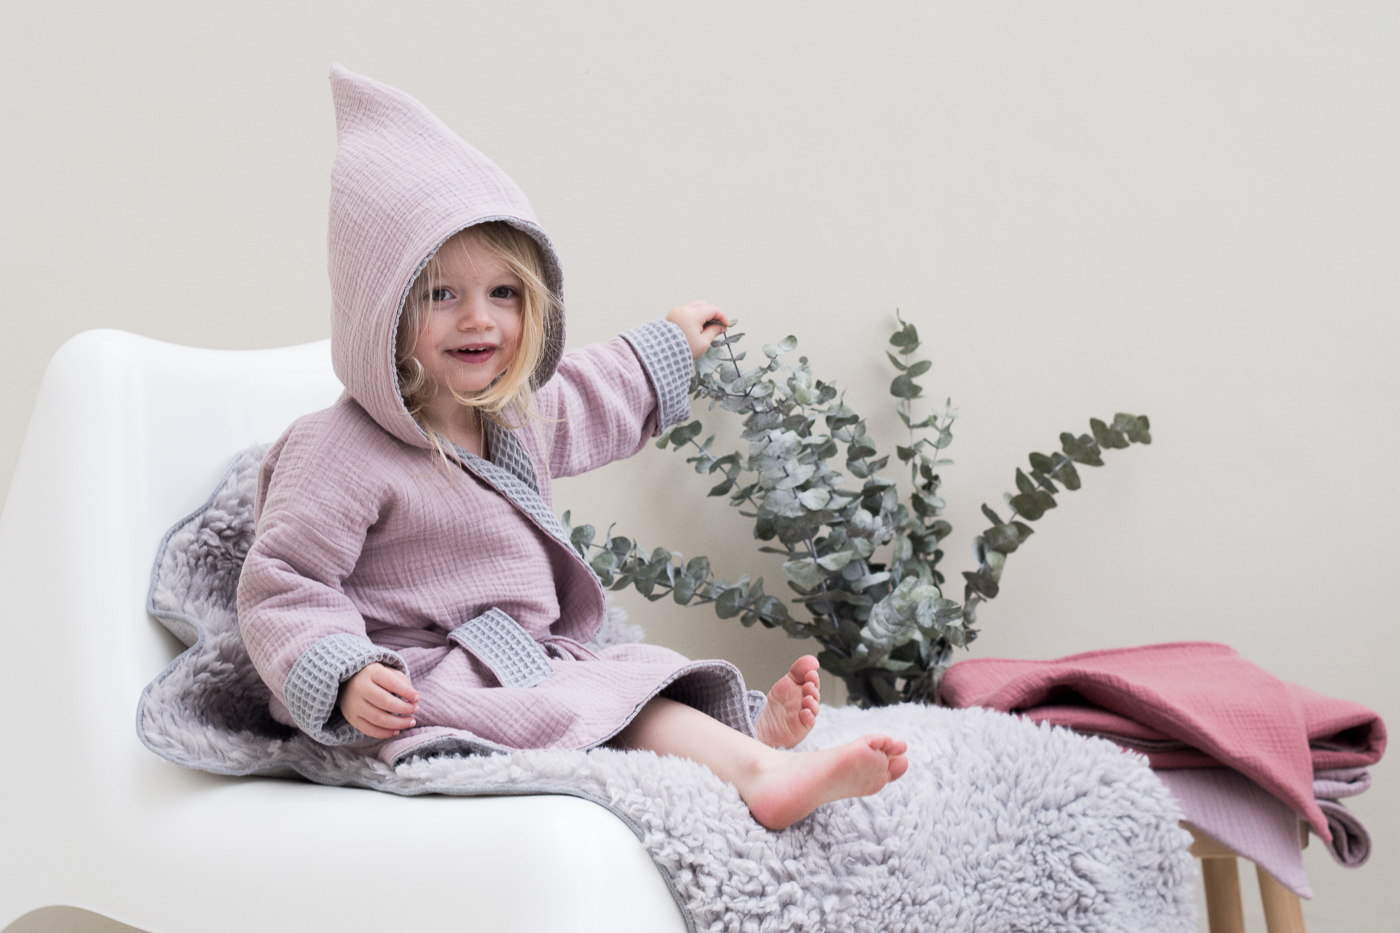 Epic elf and her bathrobe